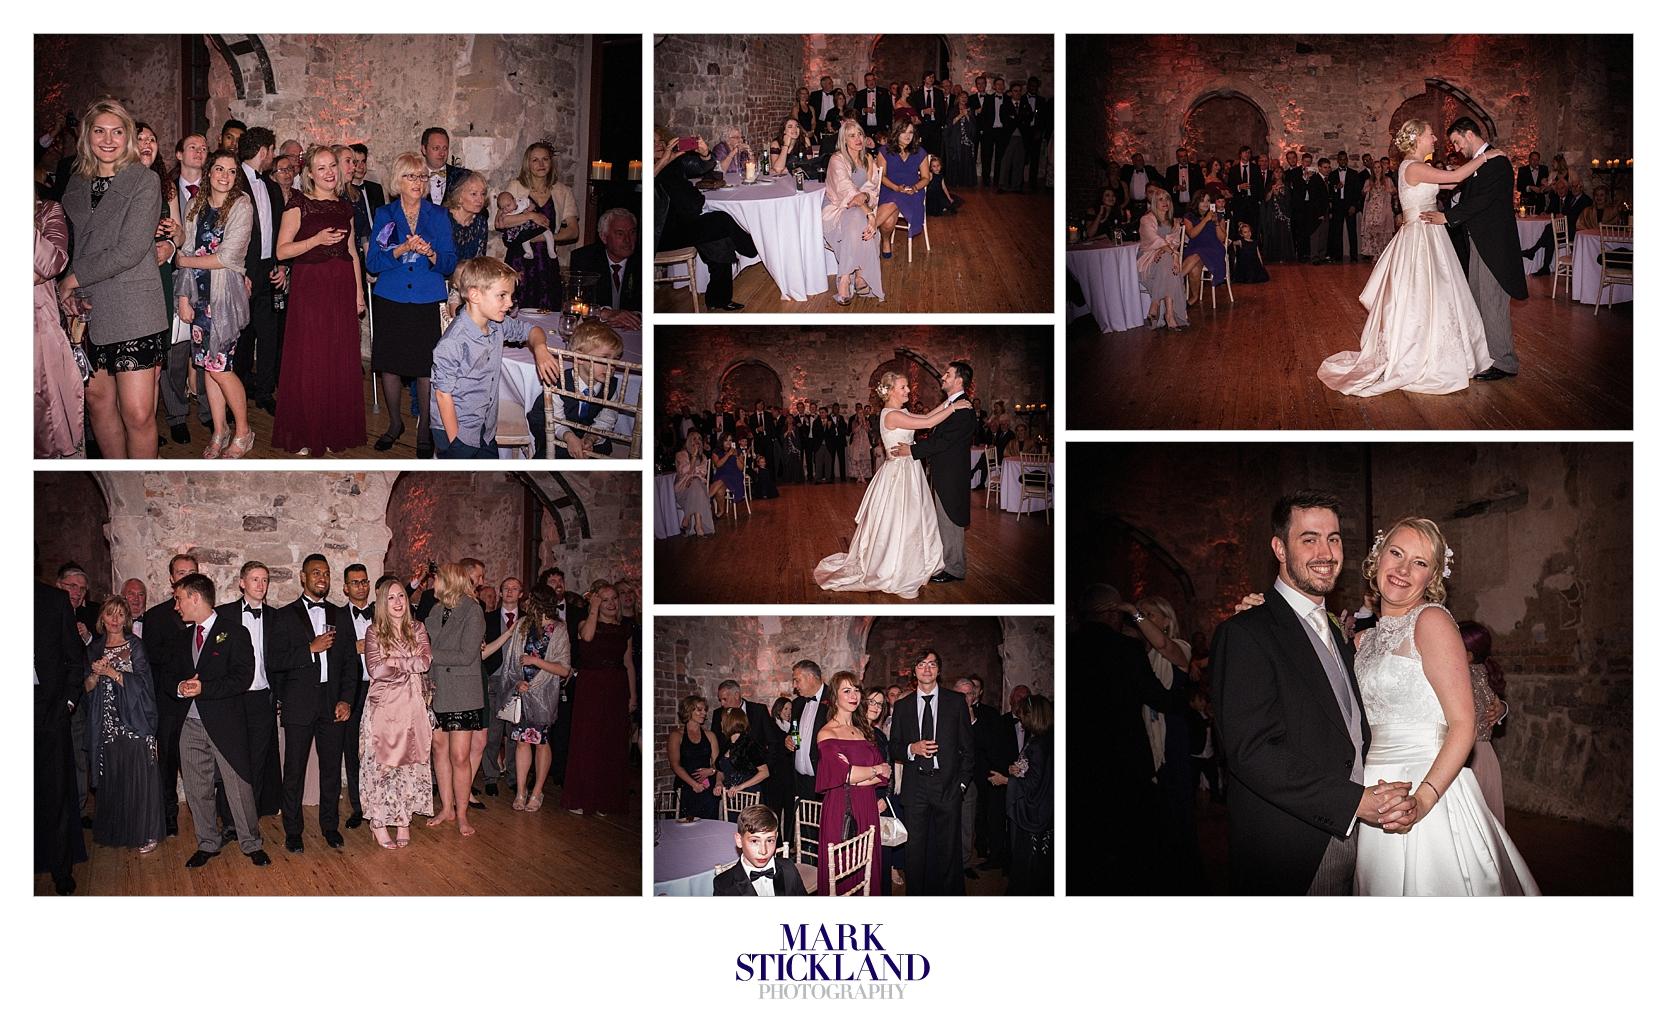 lulworth_castle_wedding_dorset_mark stickland photography.37